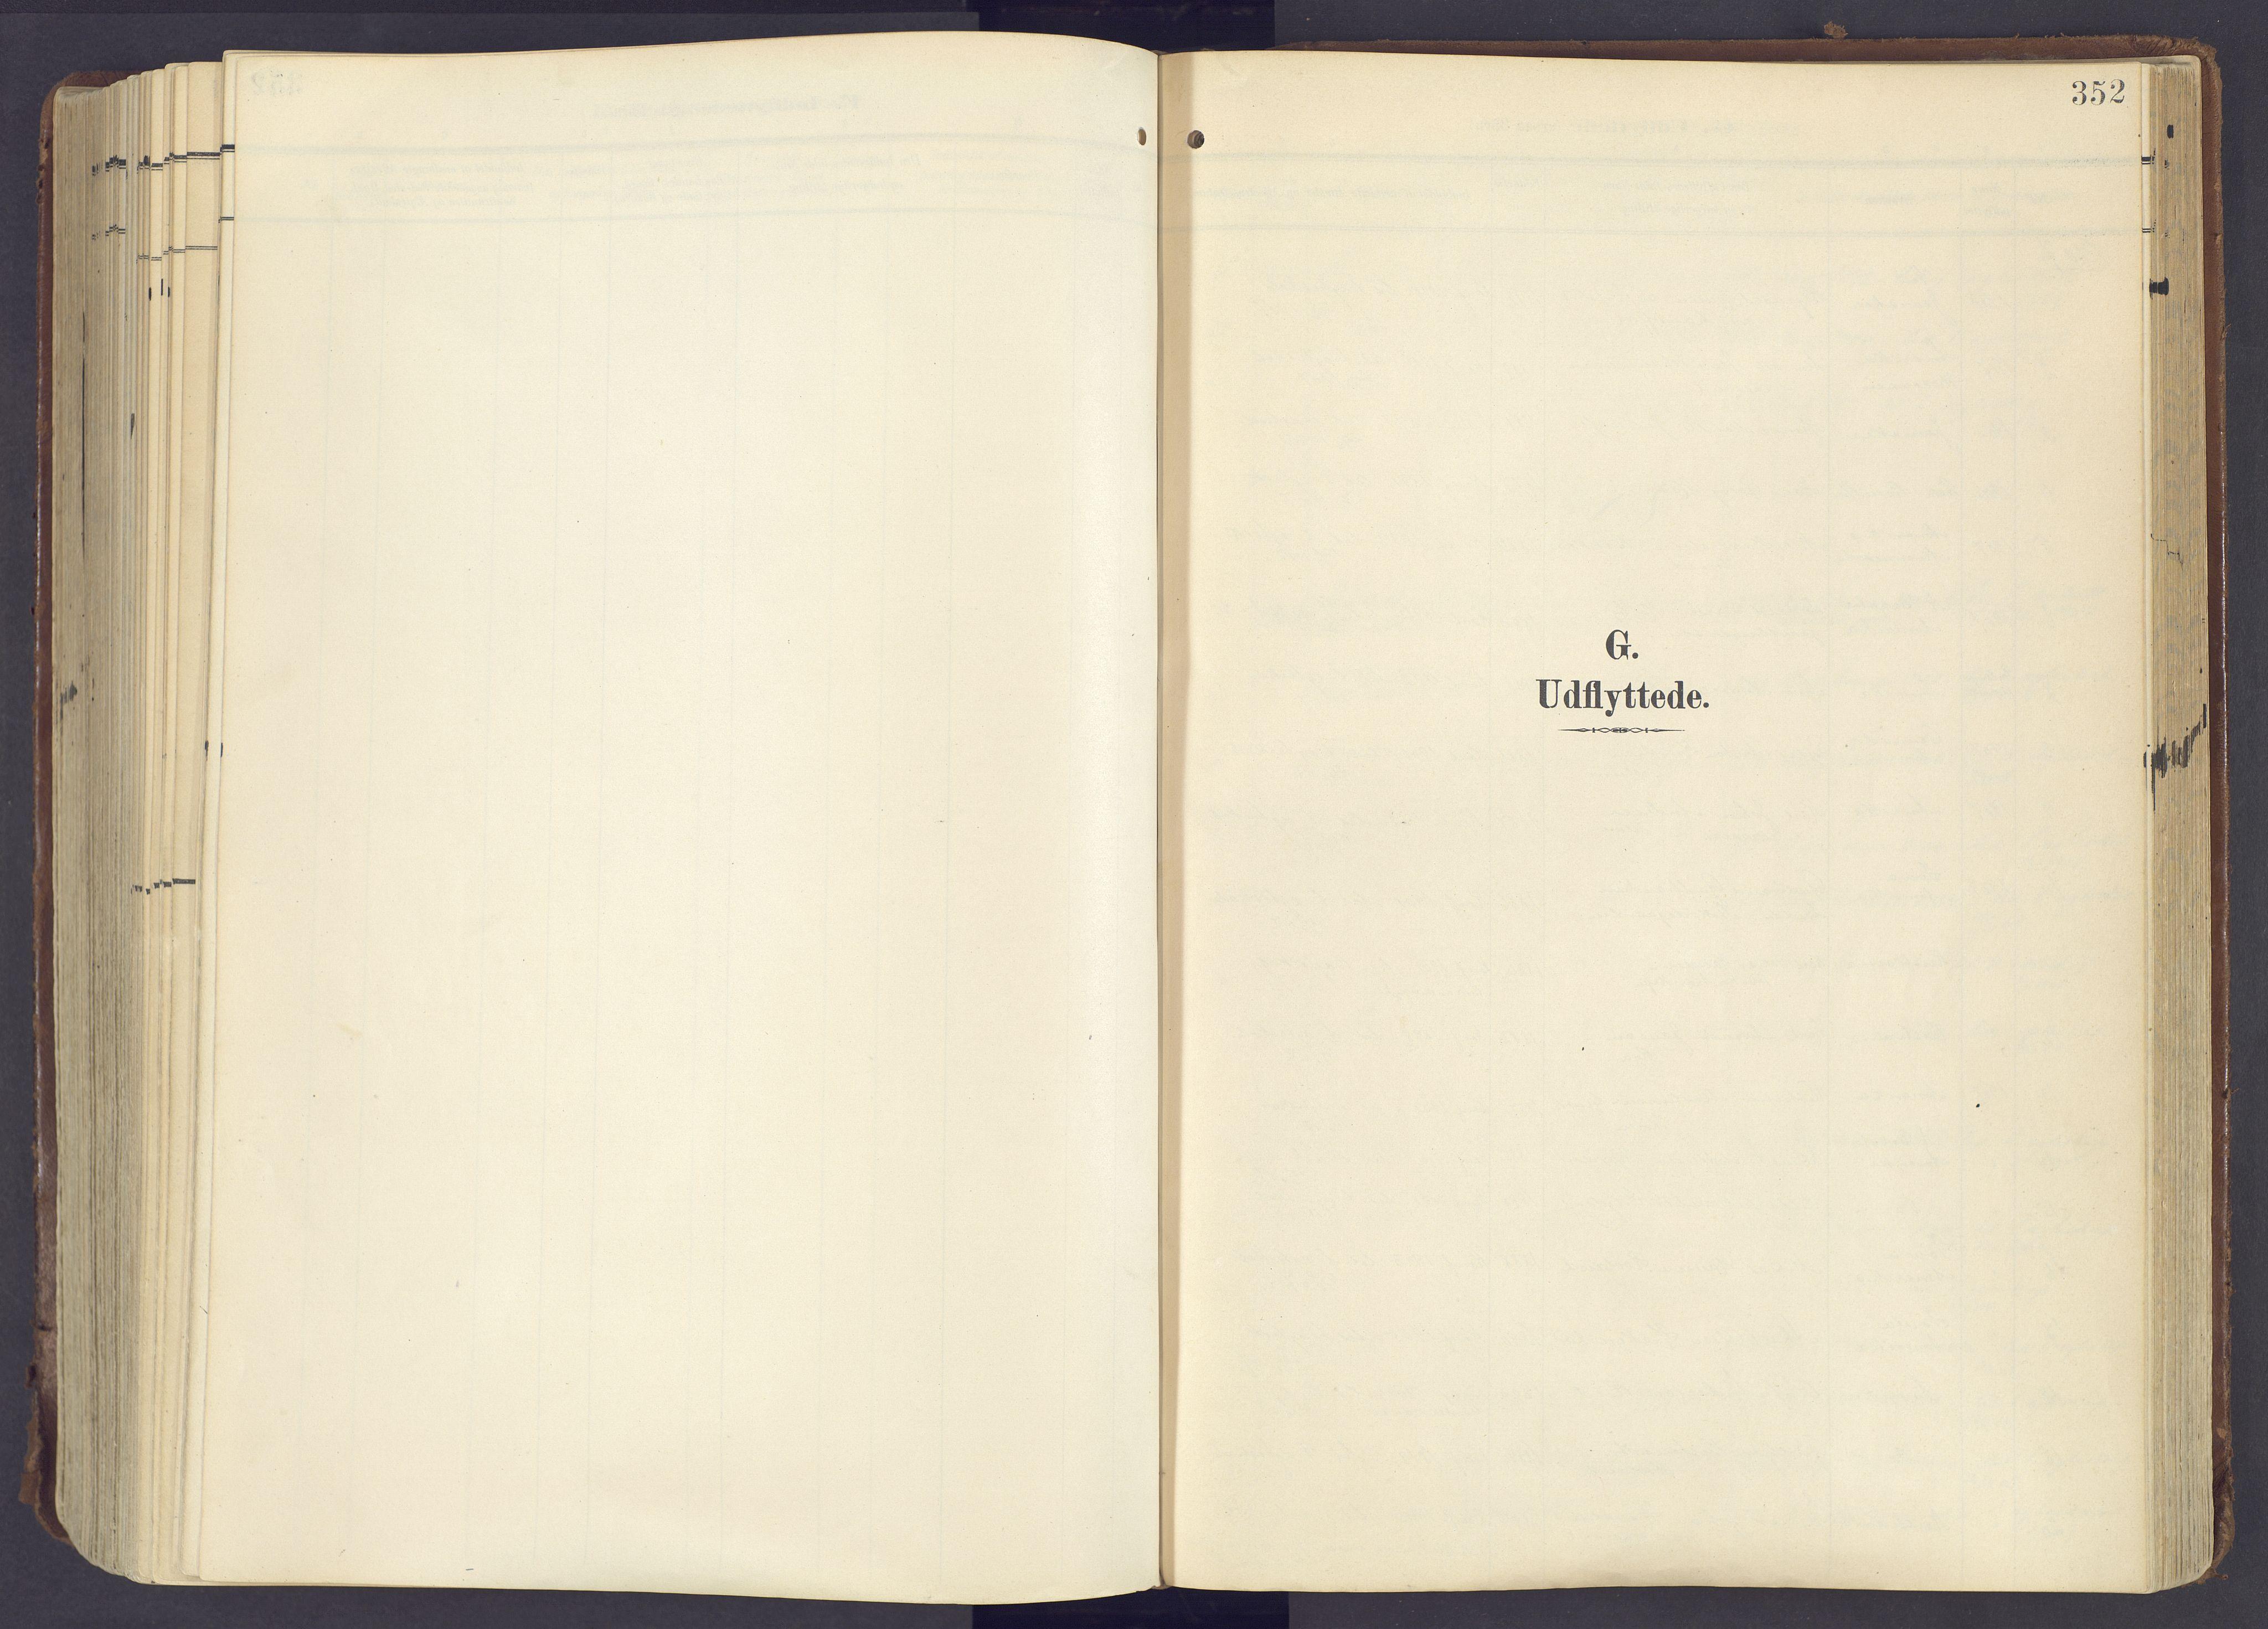 SAH, Lunner prestekontor, H/Ha/Haa/L0001: Ministerialbok nr. 1, 1907-1922, s. 352